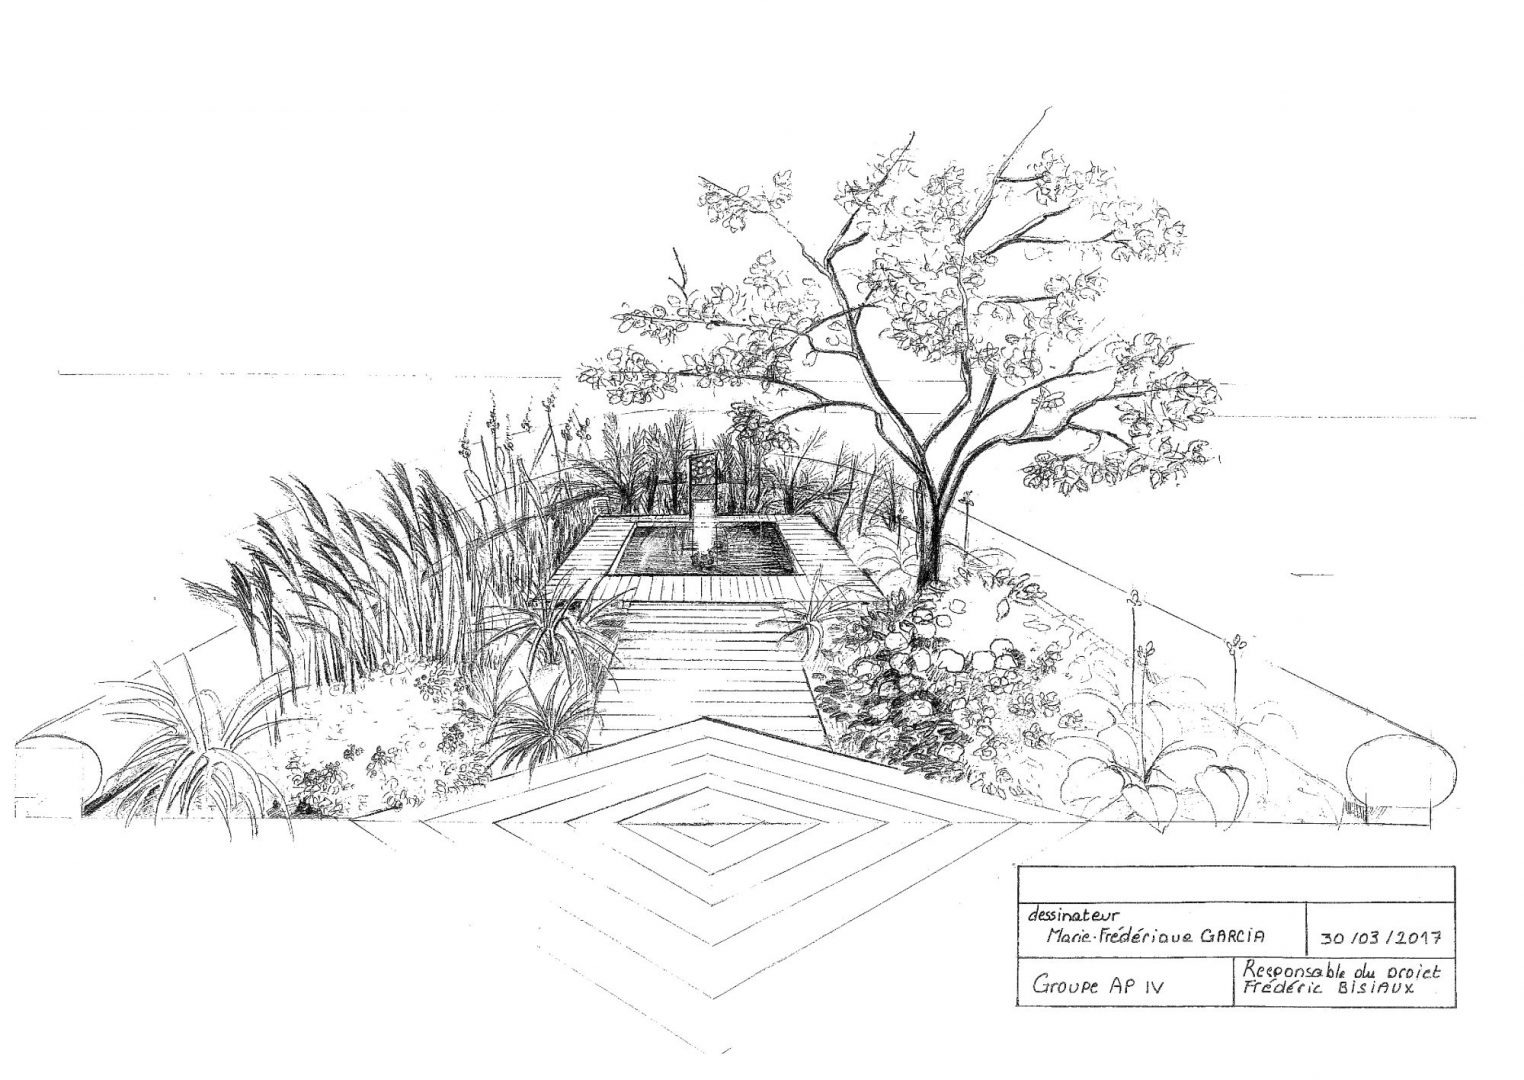 Projet d'aménagement paysager